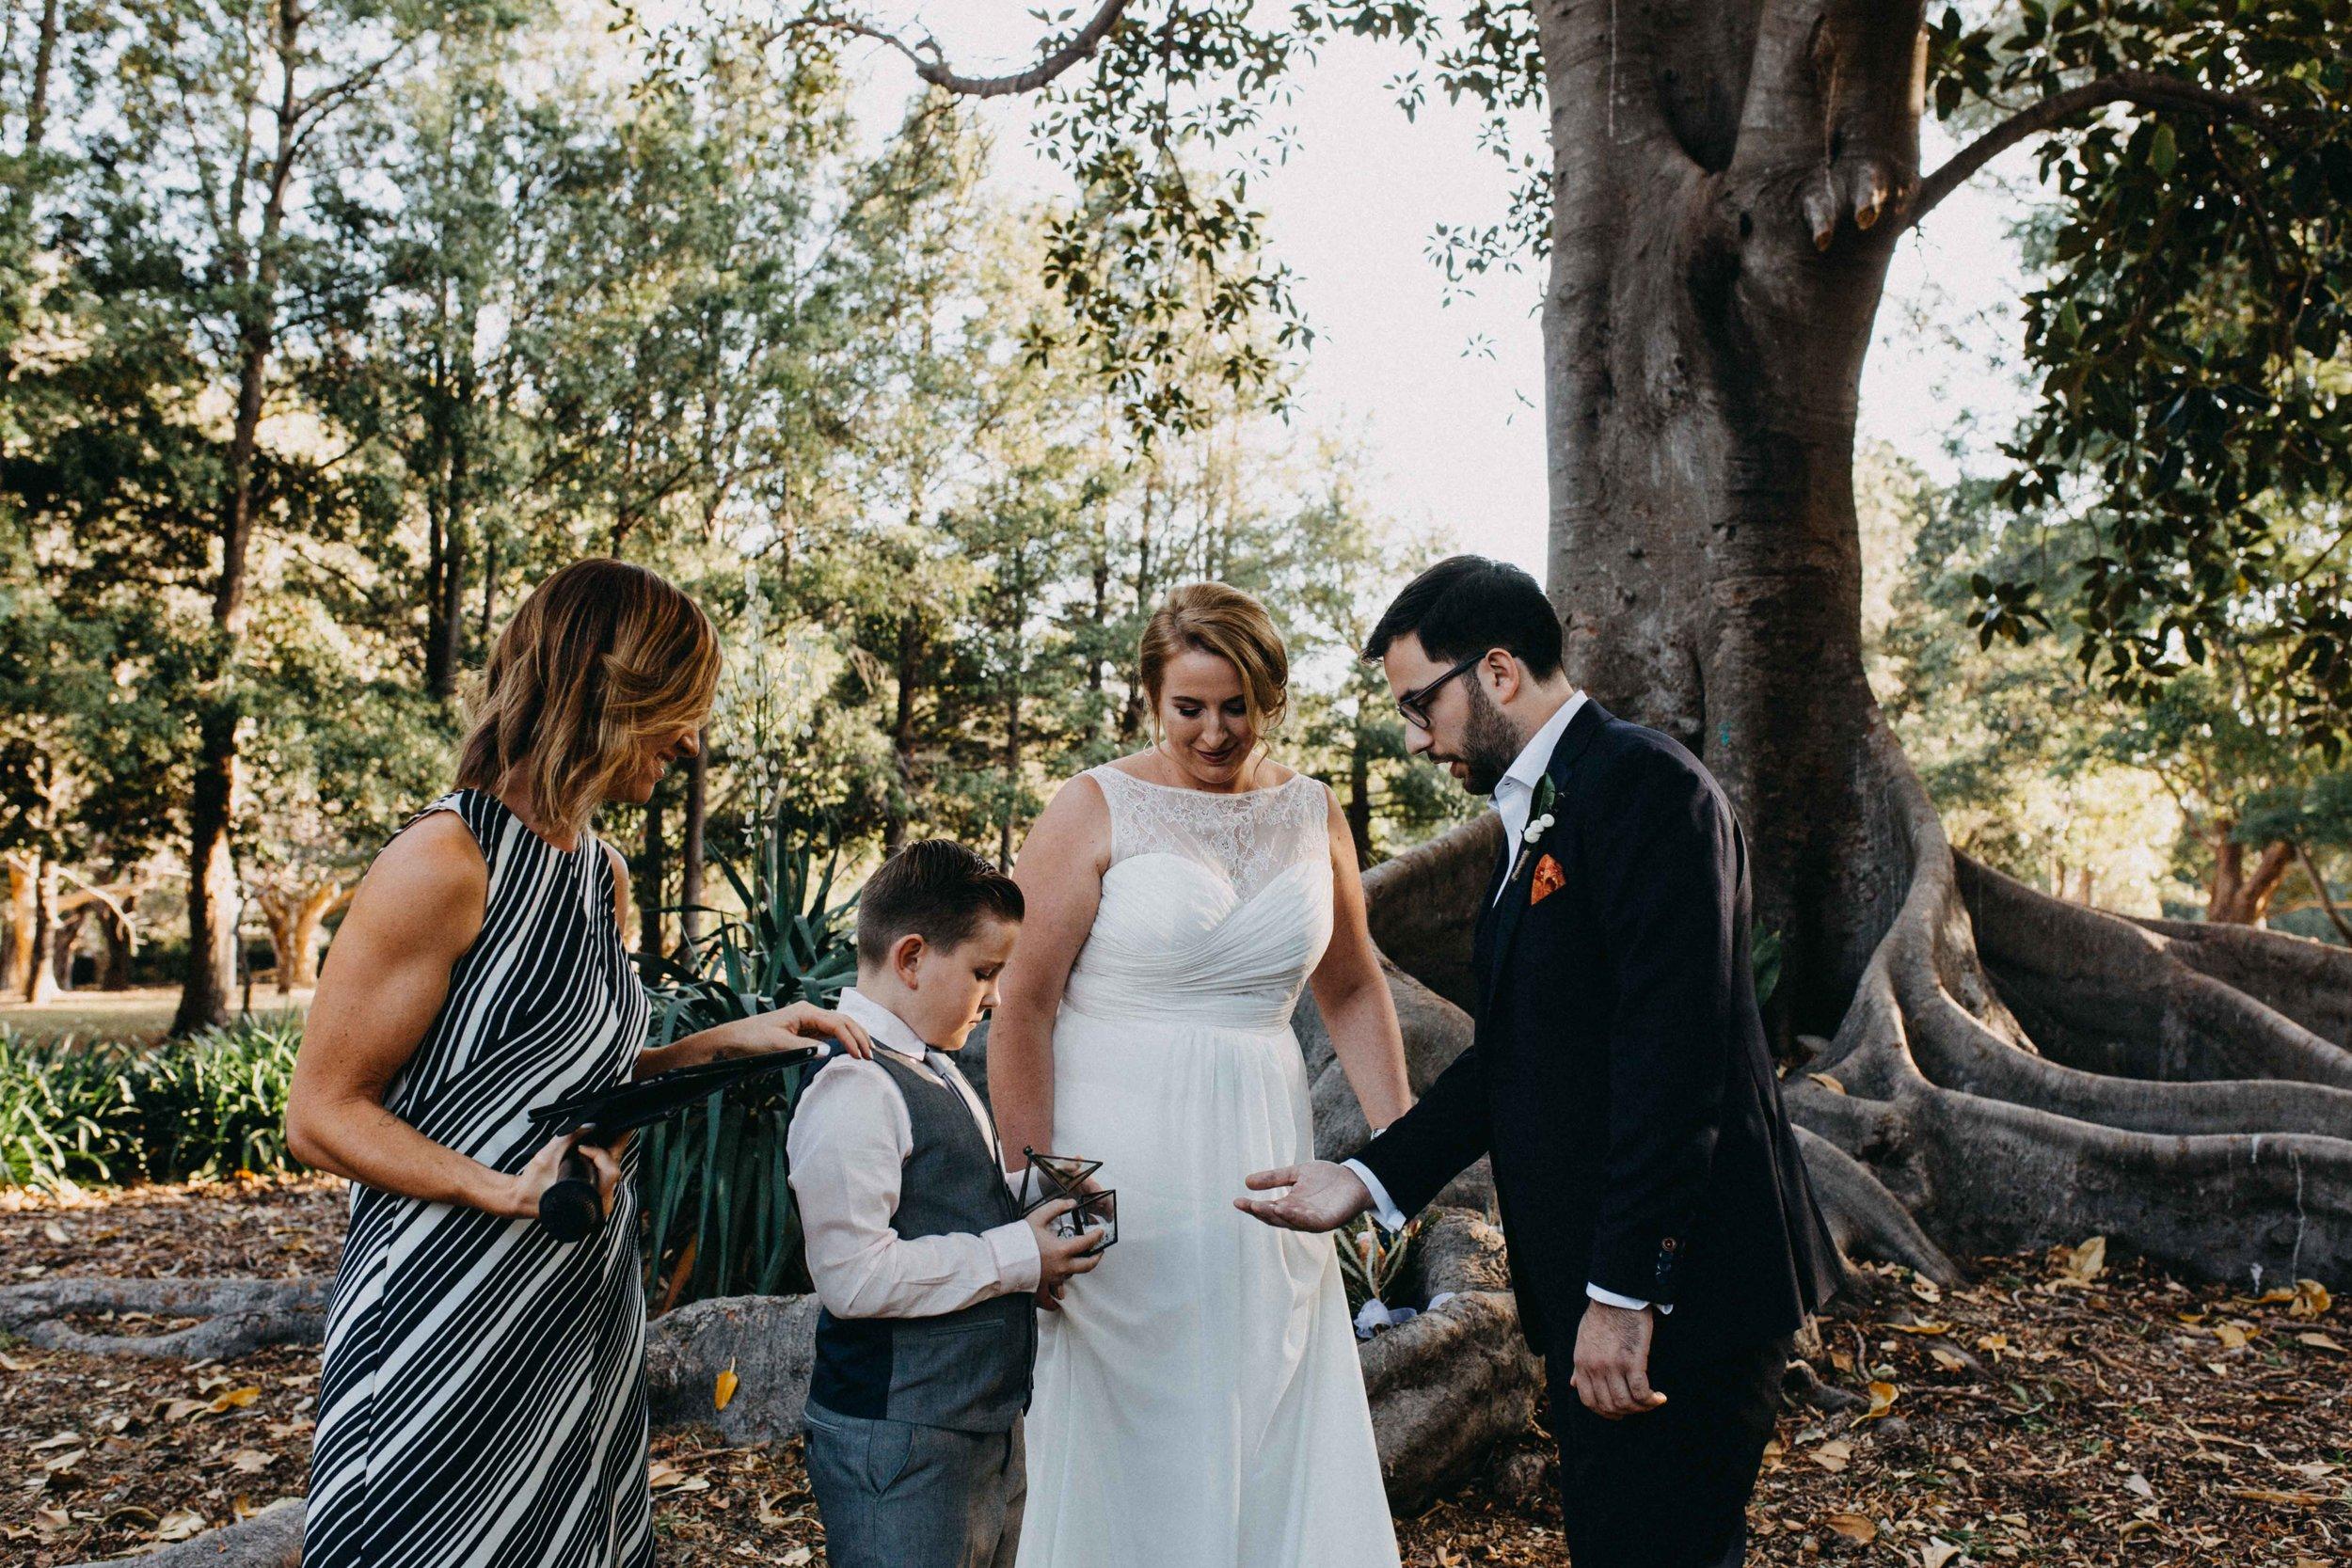 cabarita-park-sydney-wedding-emilyobrienphotography.net-26.jpg